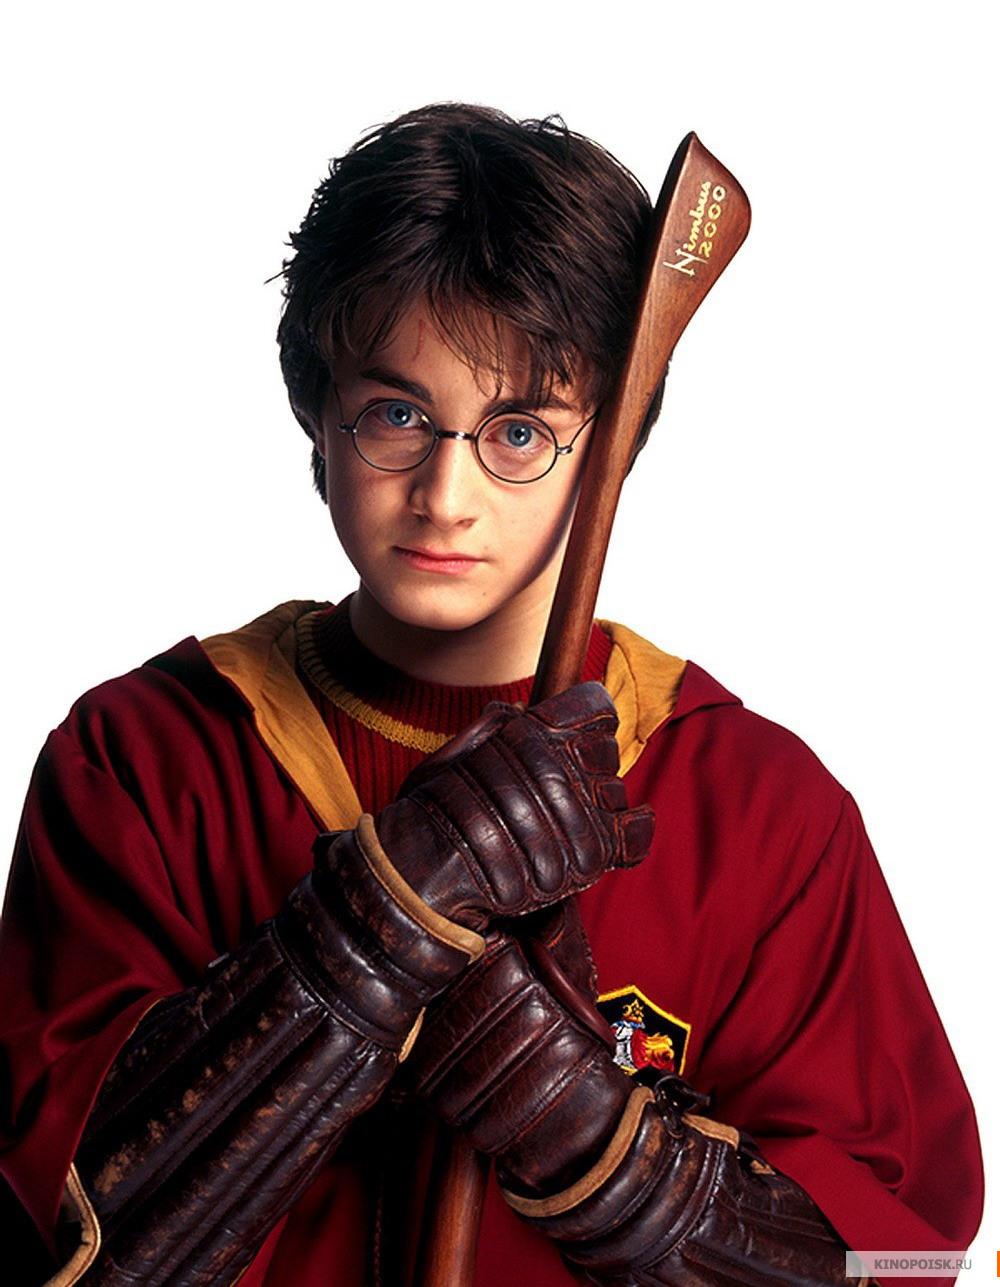 Фото: Гарри Поттер и Тайная комната